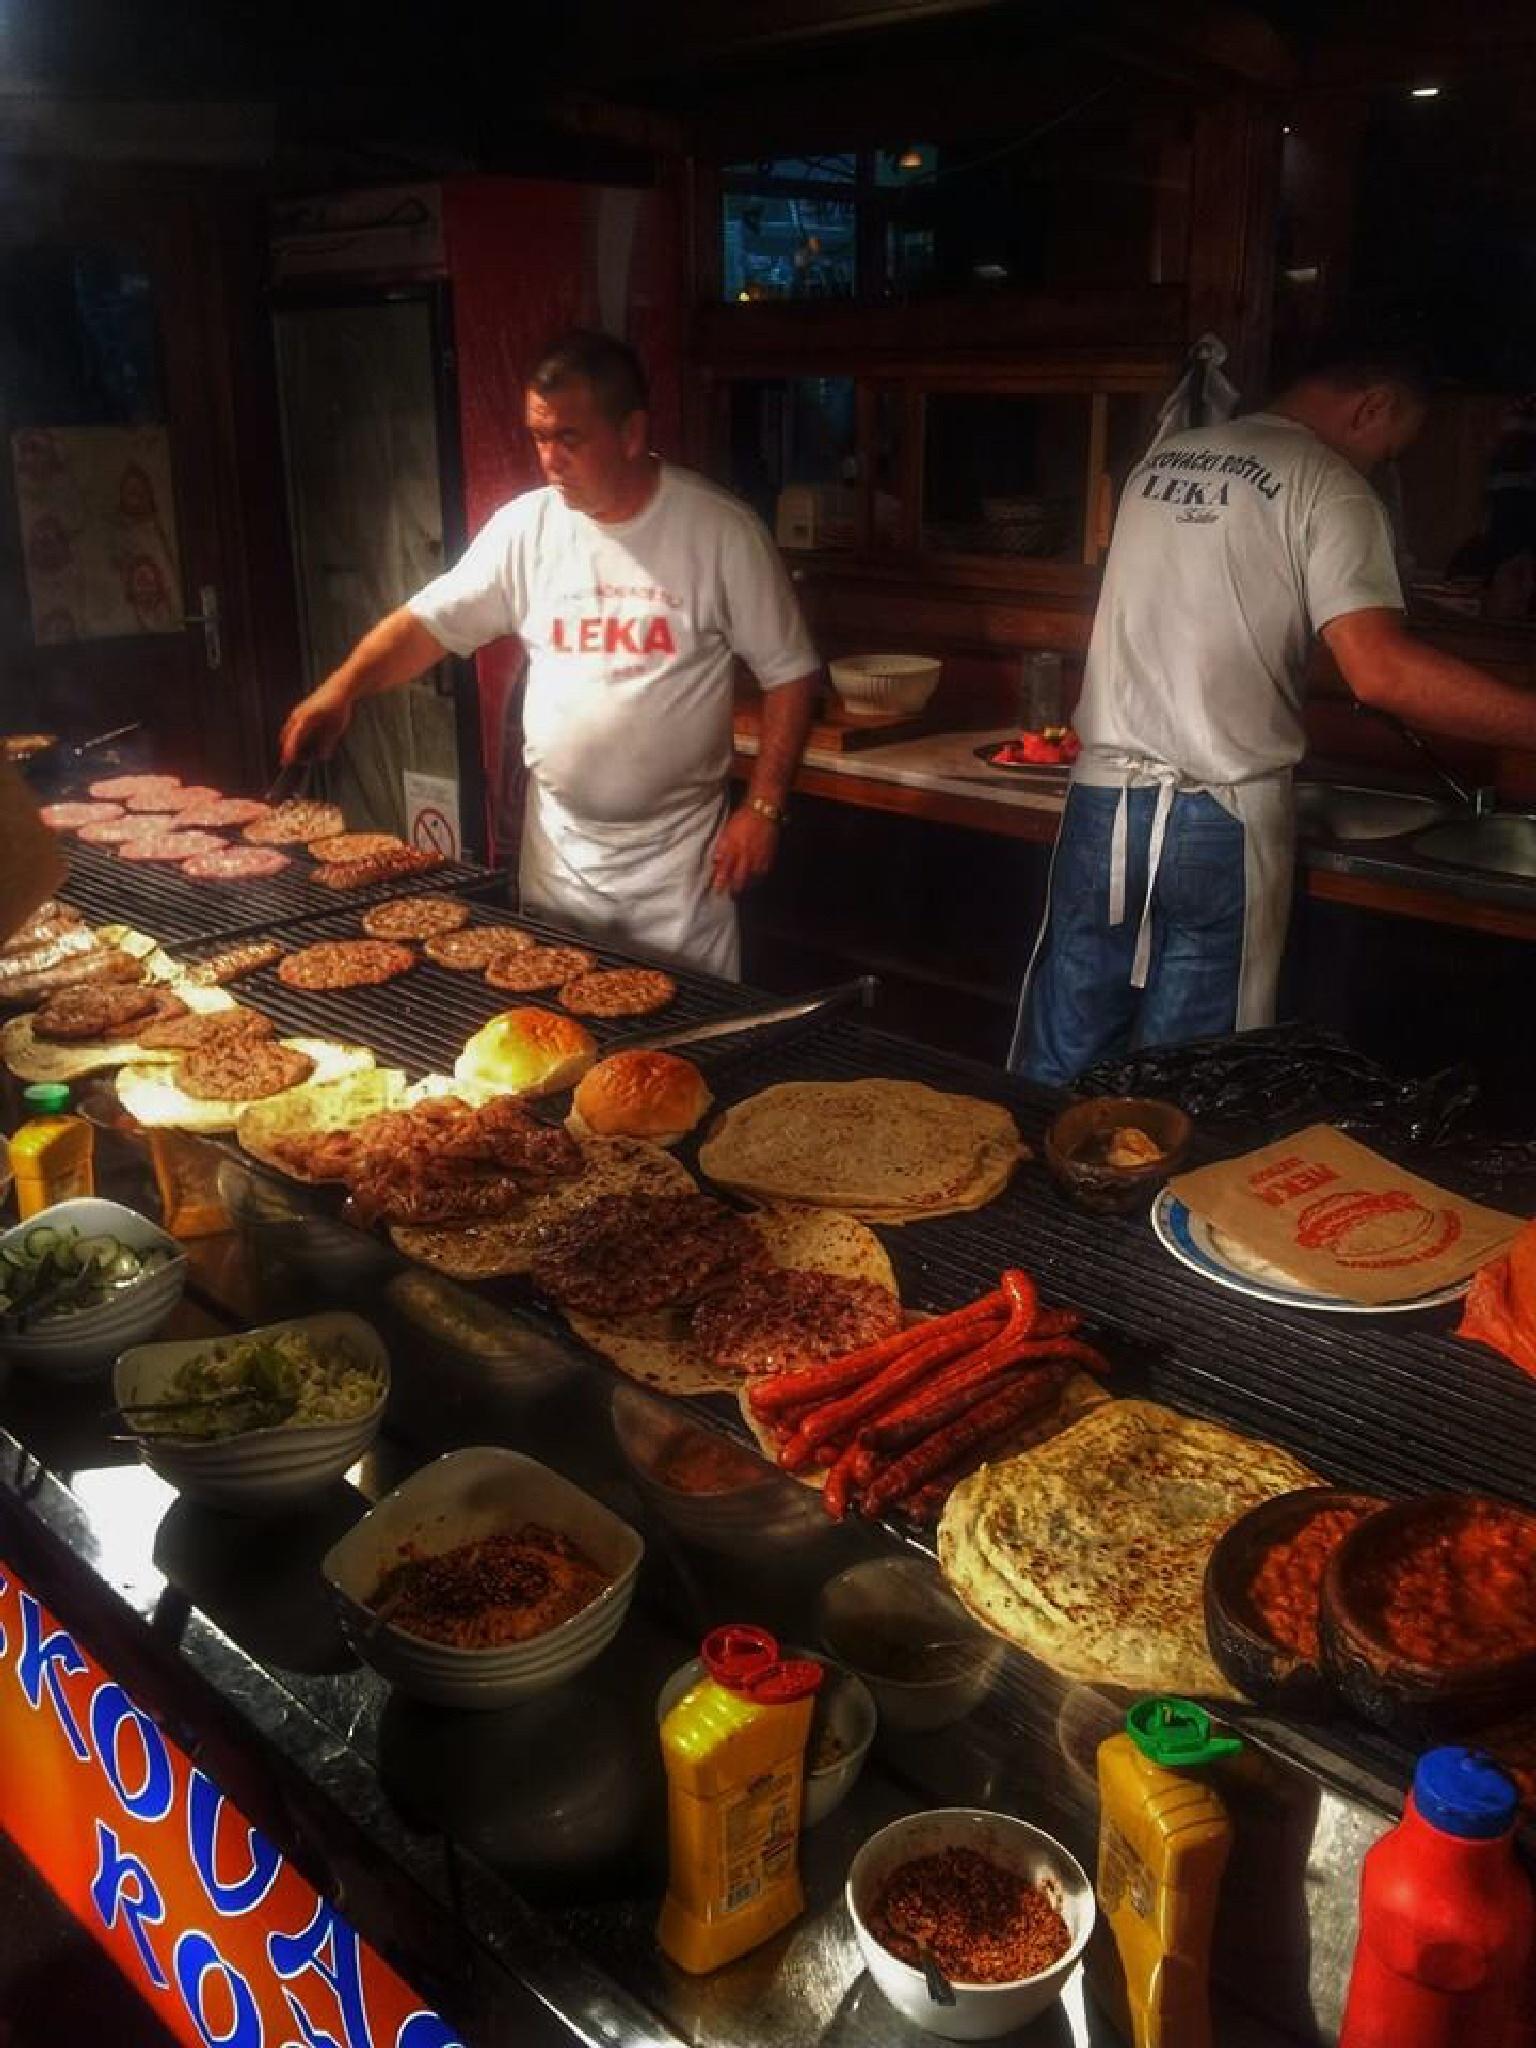 Food paradise - Zlatibor Serbia by Goran Jorganovich